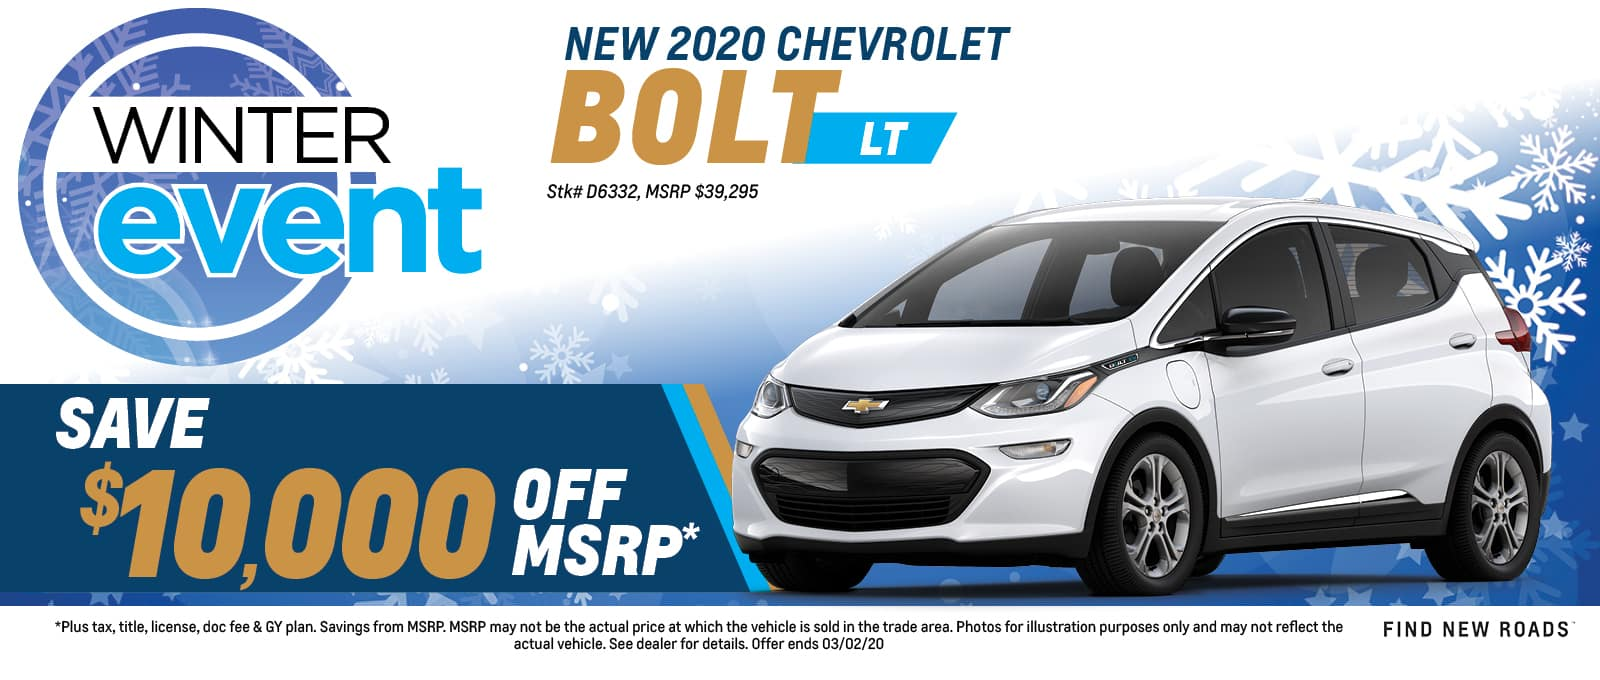 2020 Chevy Bolt